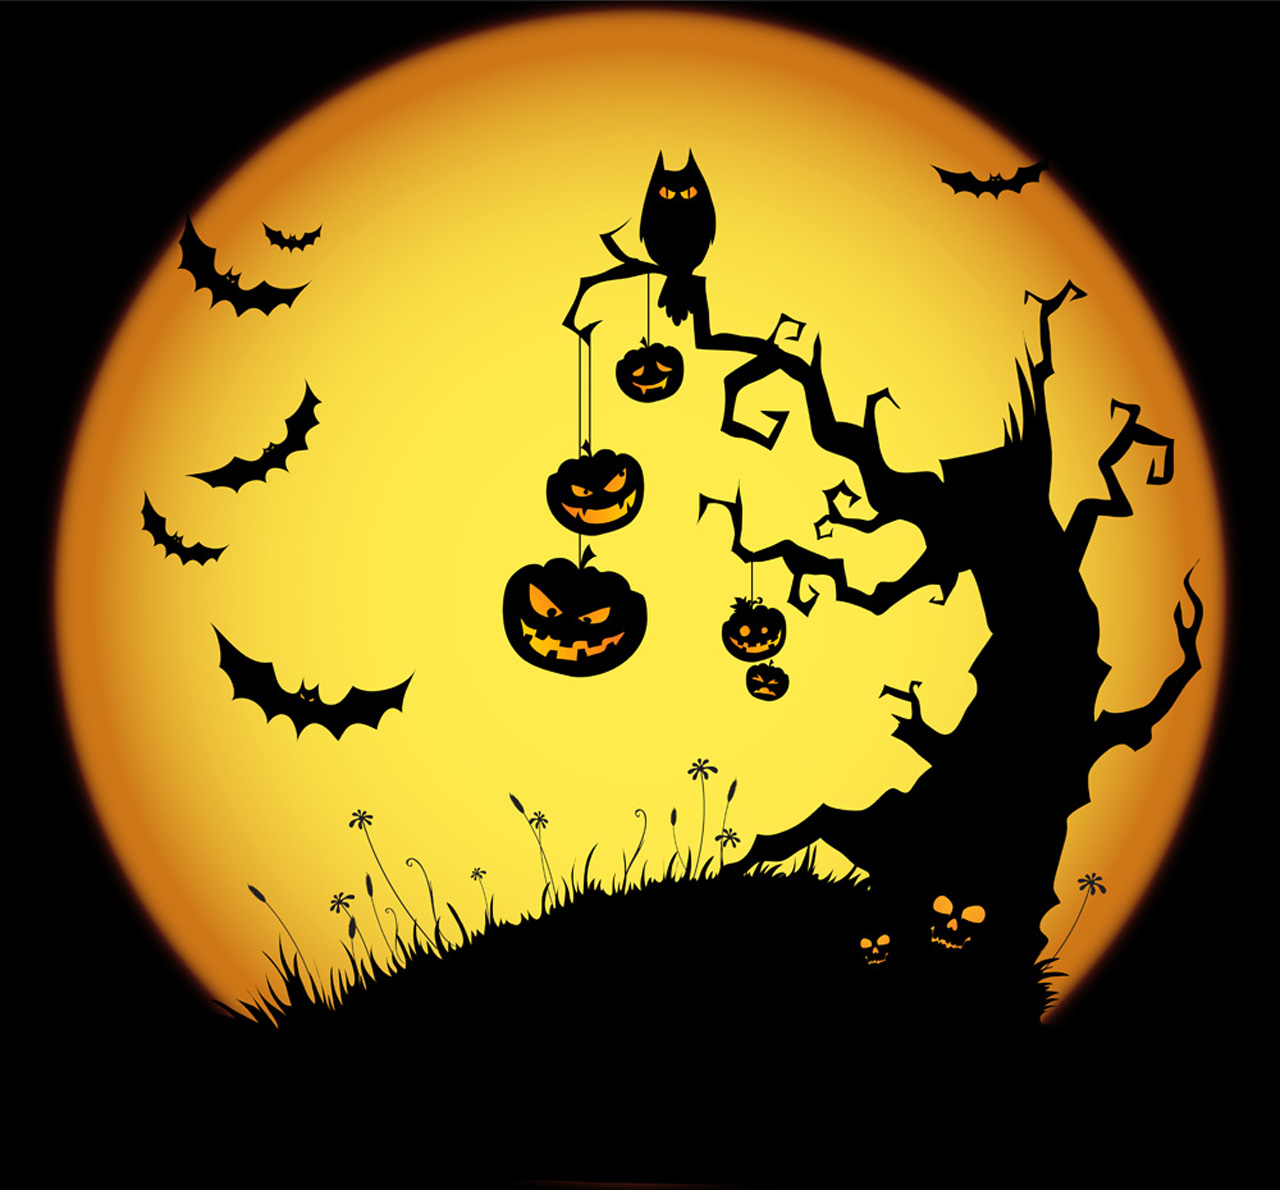 6792513-free-halloween-wallpaper